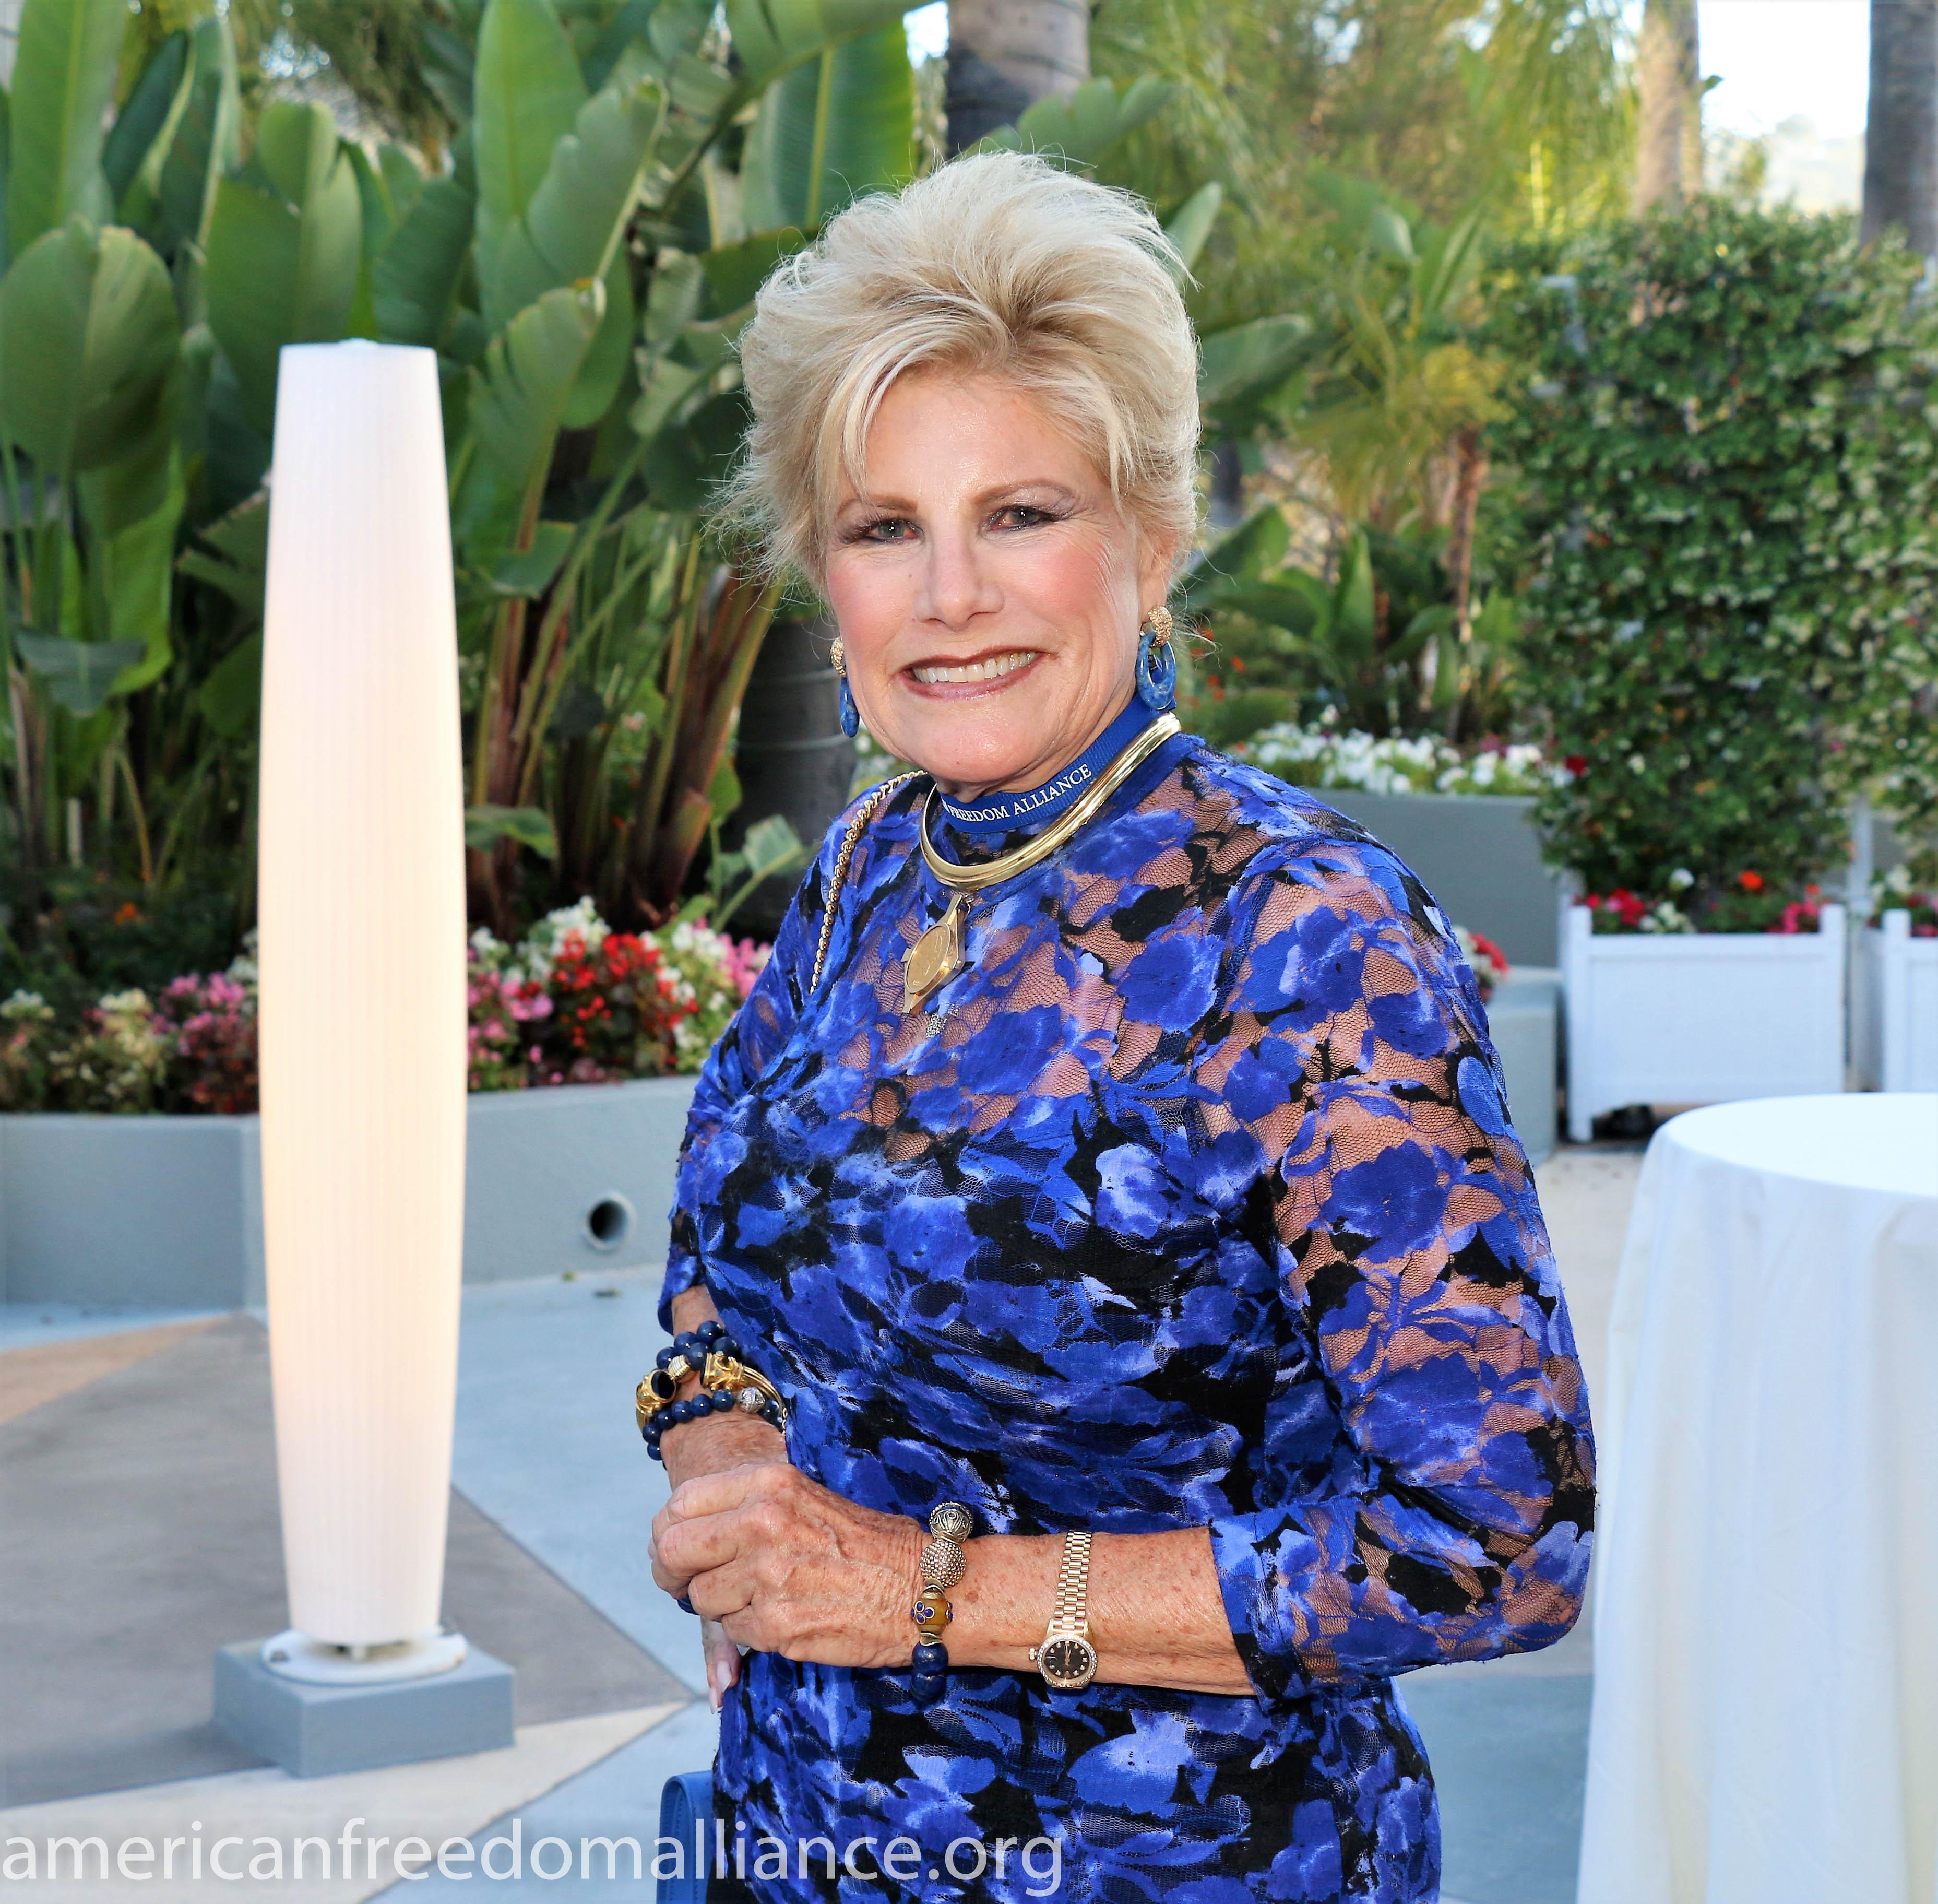 Valerie Hoffman